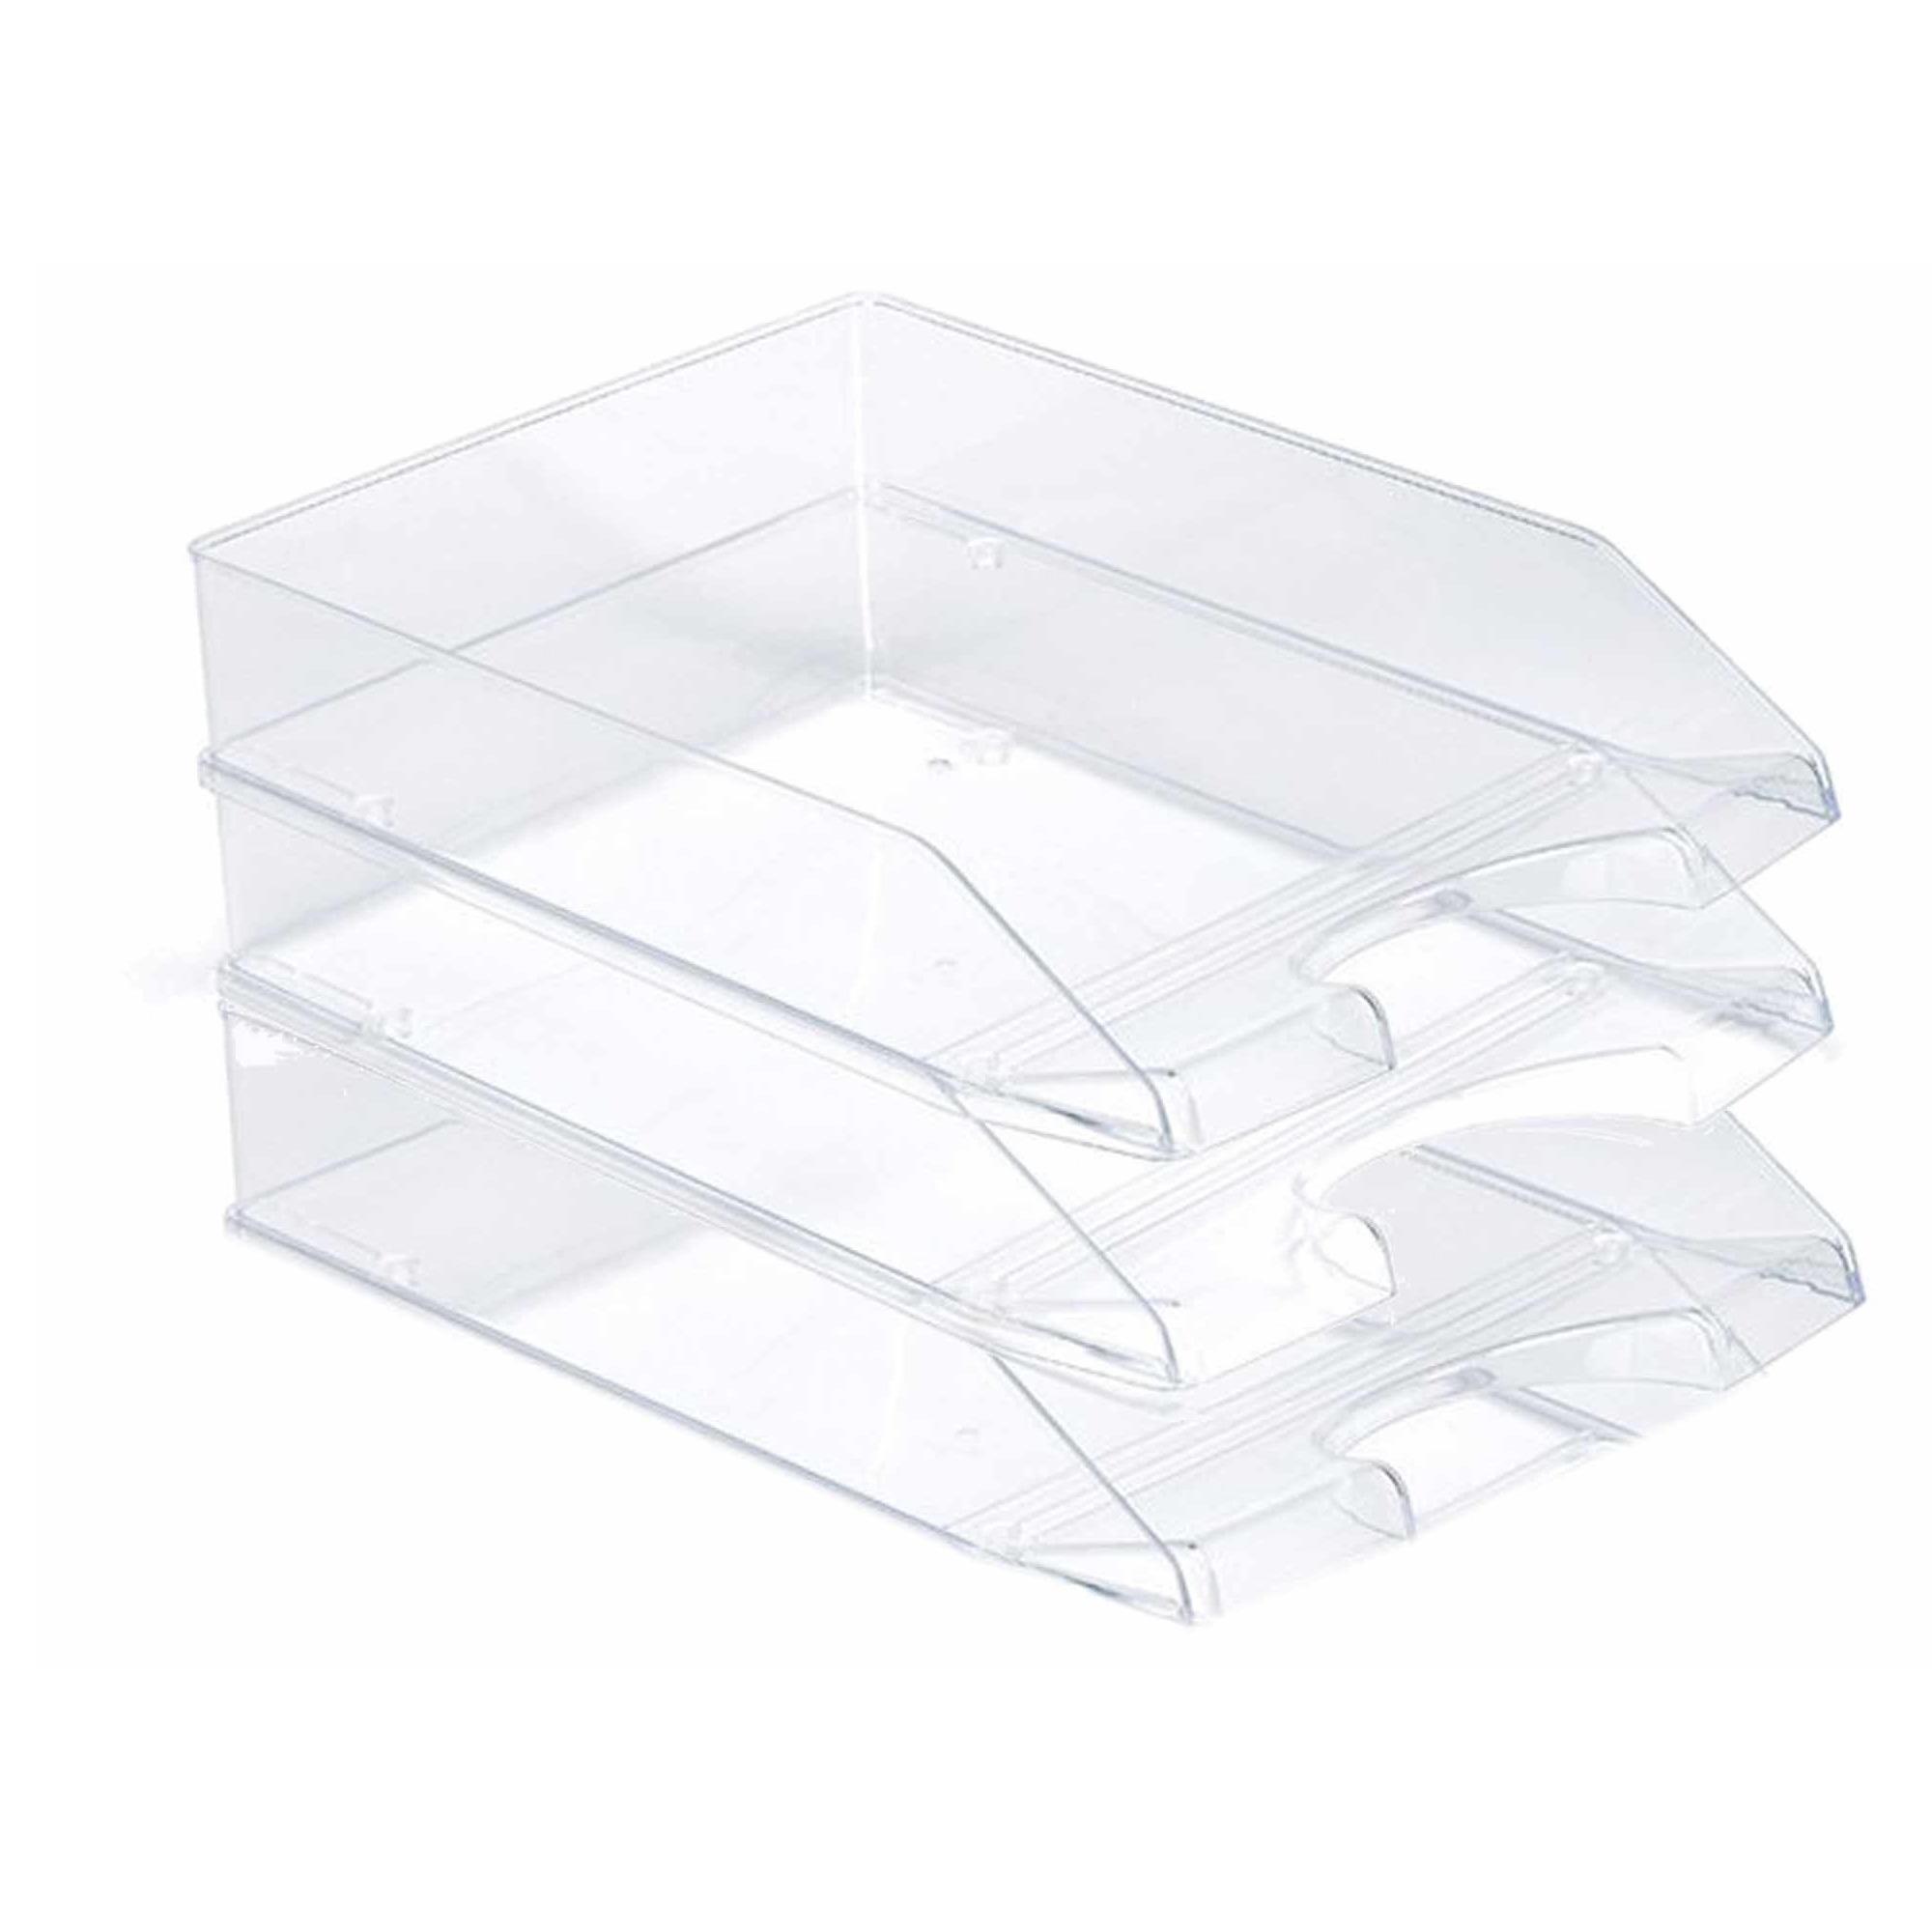 Pakket van 3x stuks postbakjejes transparant a4 formaat